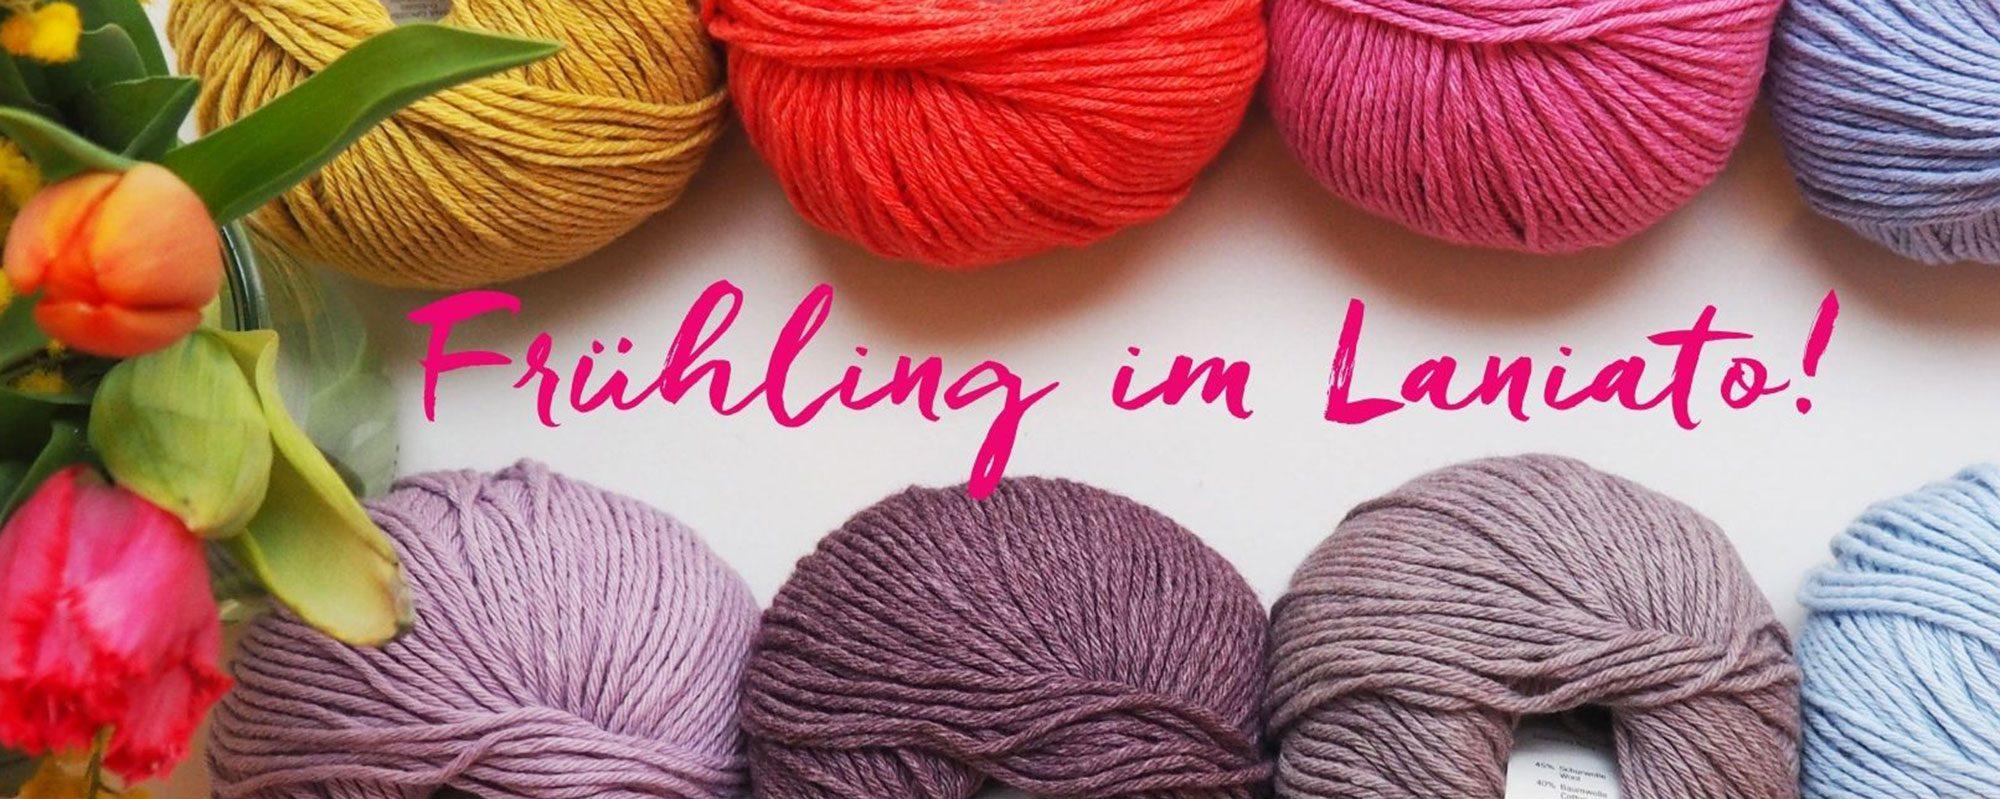 Frühling-im-Laniato!-(3)